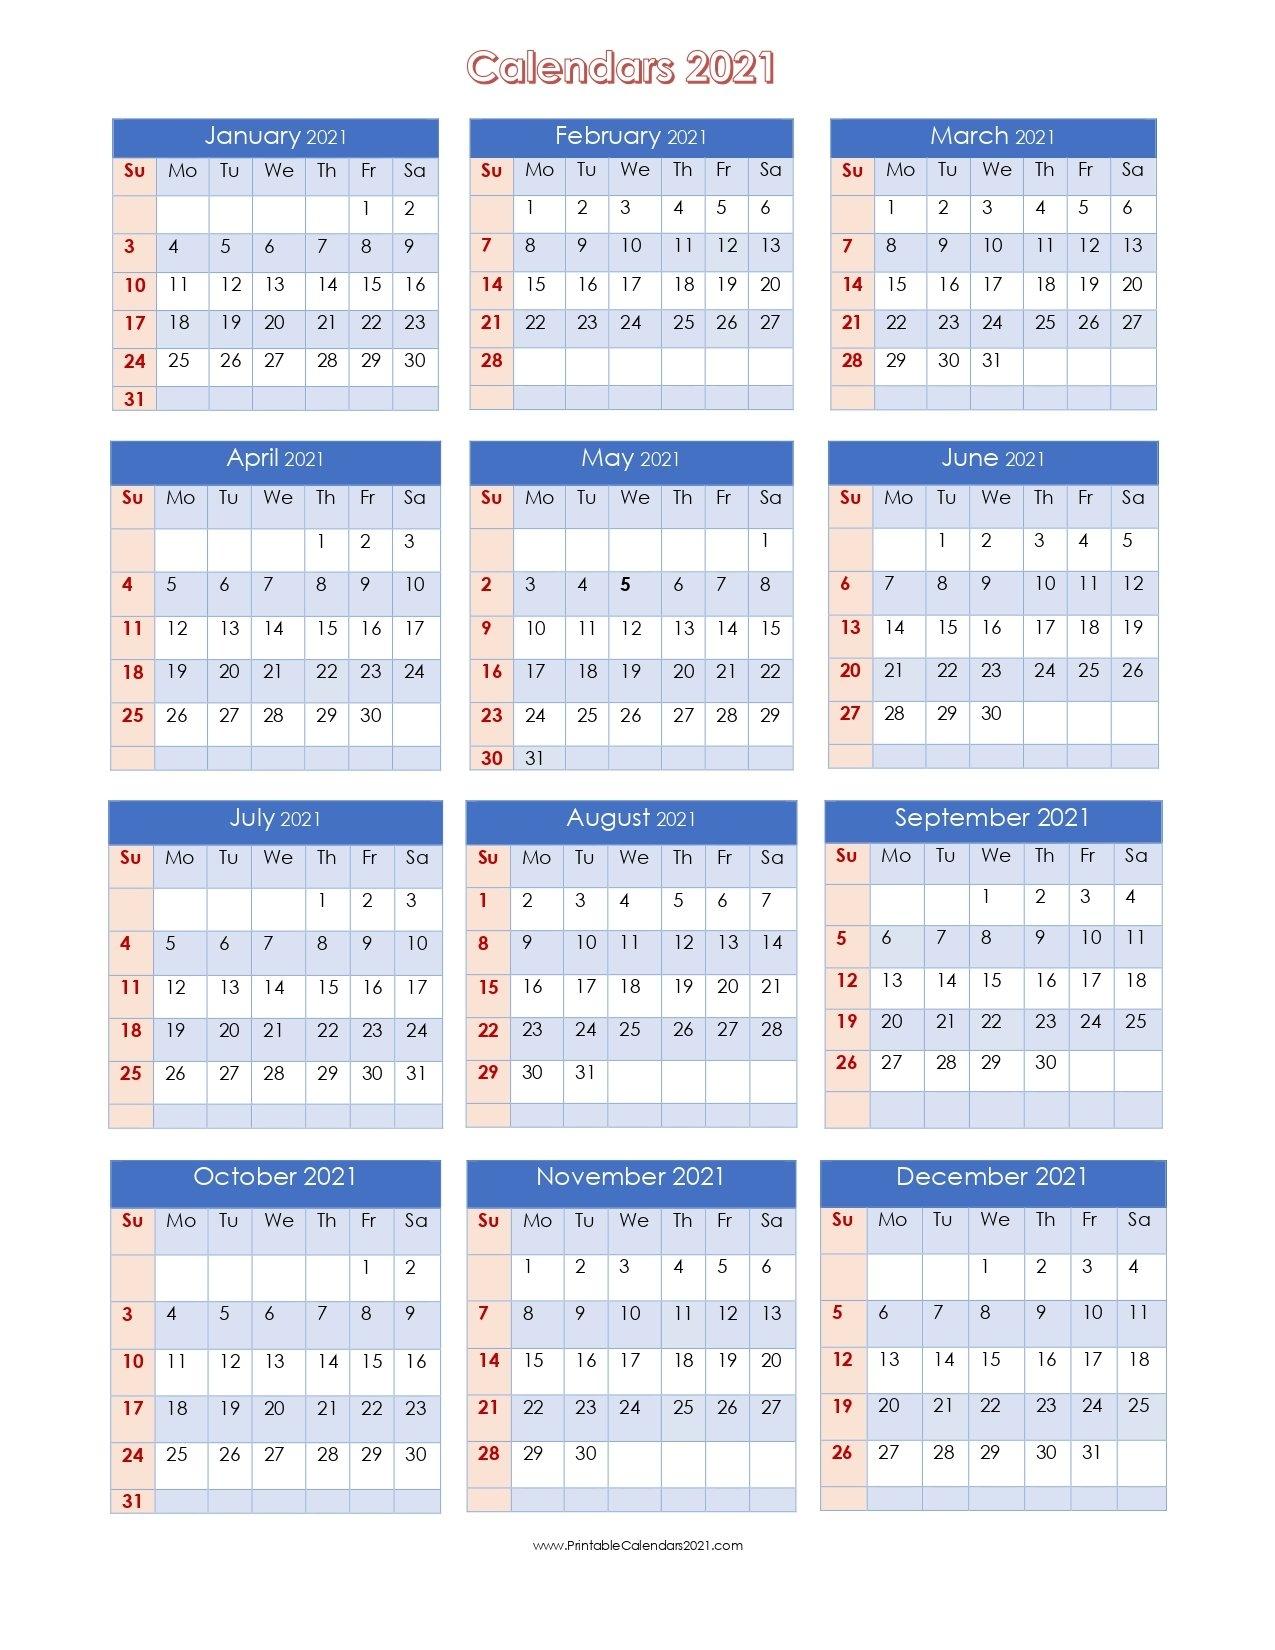 56+ Printable Calendar 2021 One Page, Printable 2021 Yearly Calendar with 2021 Julian Calendar Pdf Image